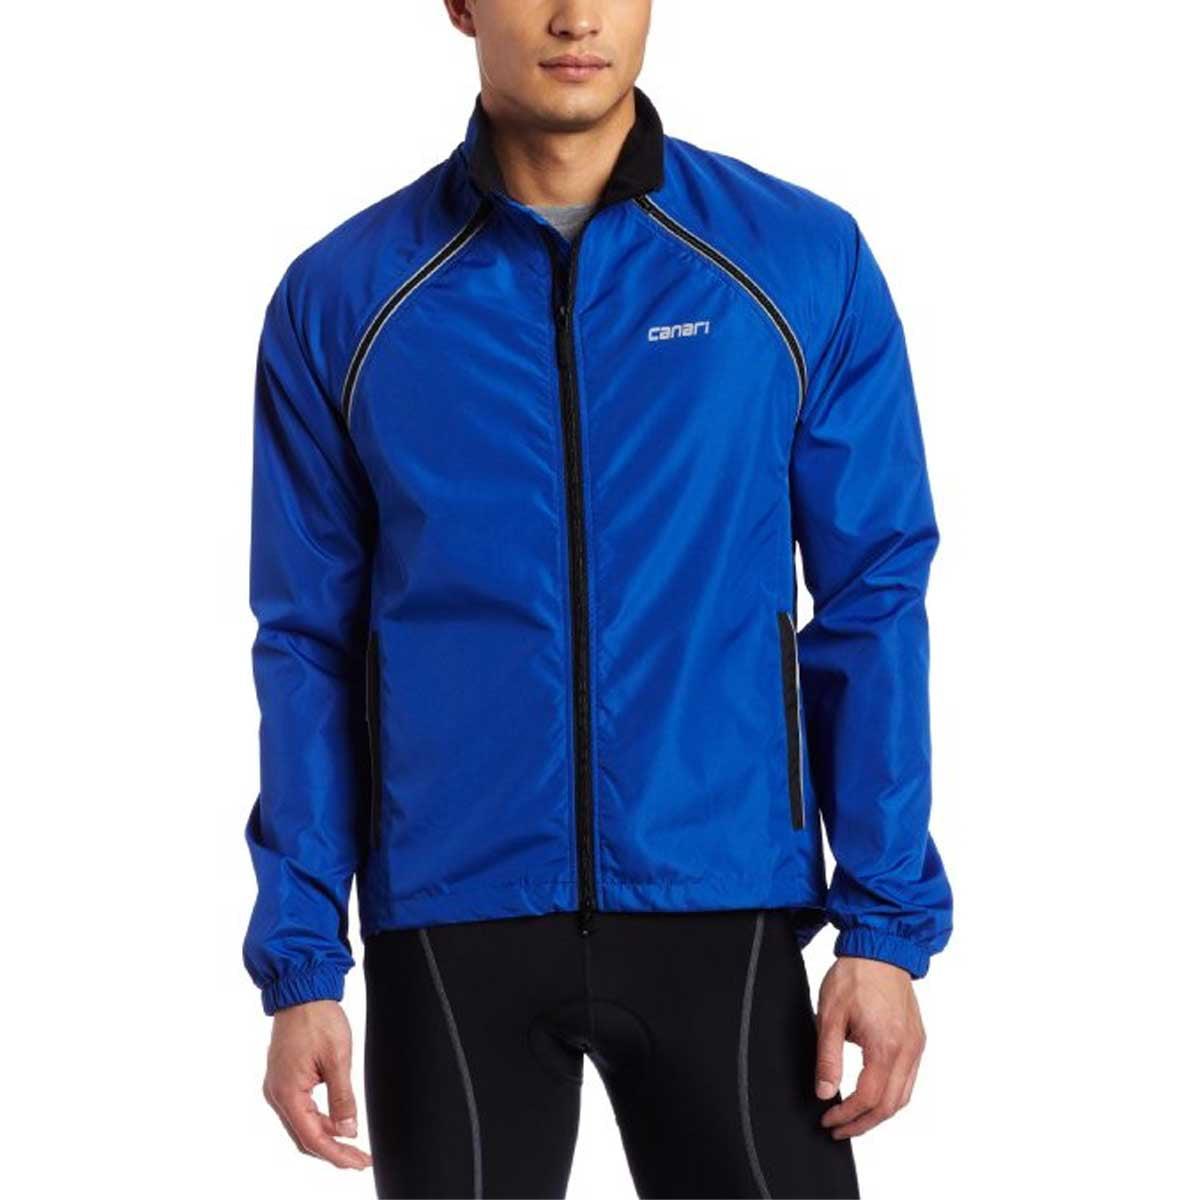 2013/14 Men's Eclipse II Cycling Jacket - 1760 (Sapphire - S)